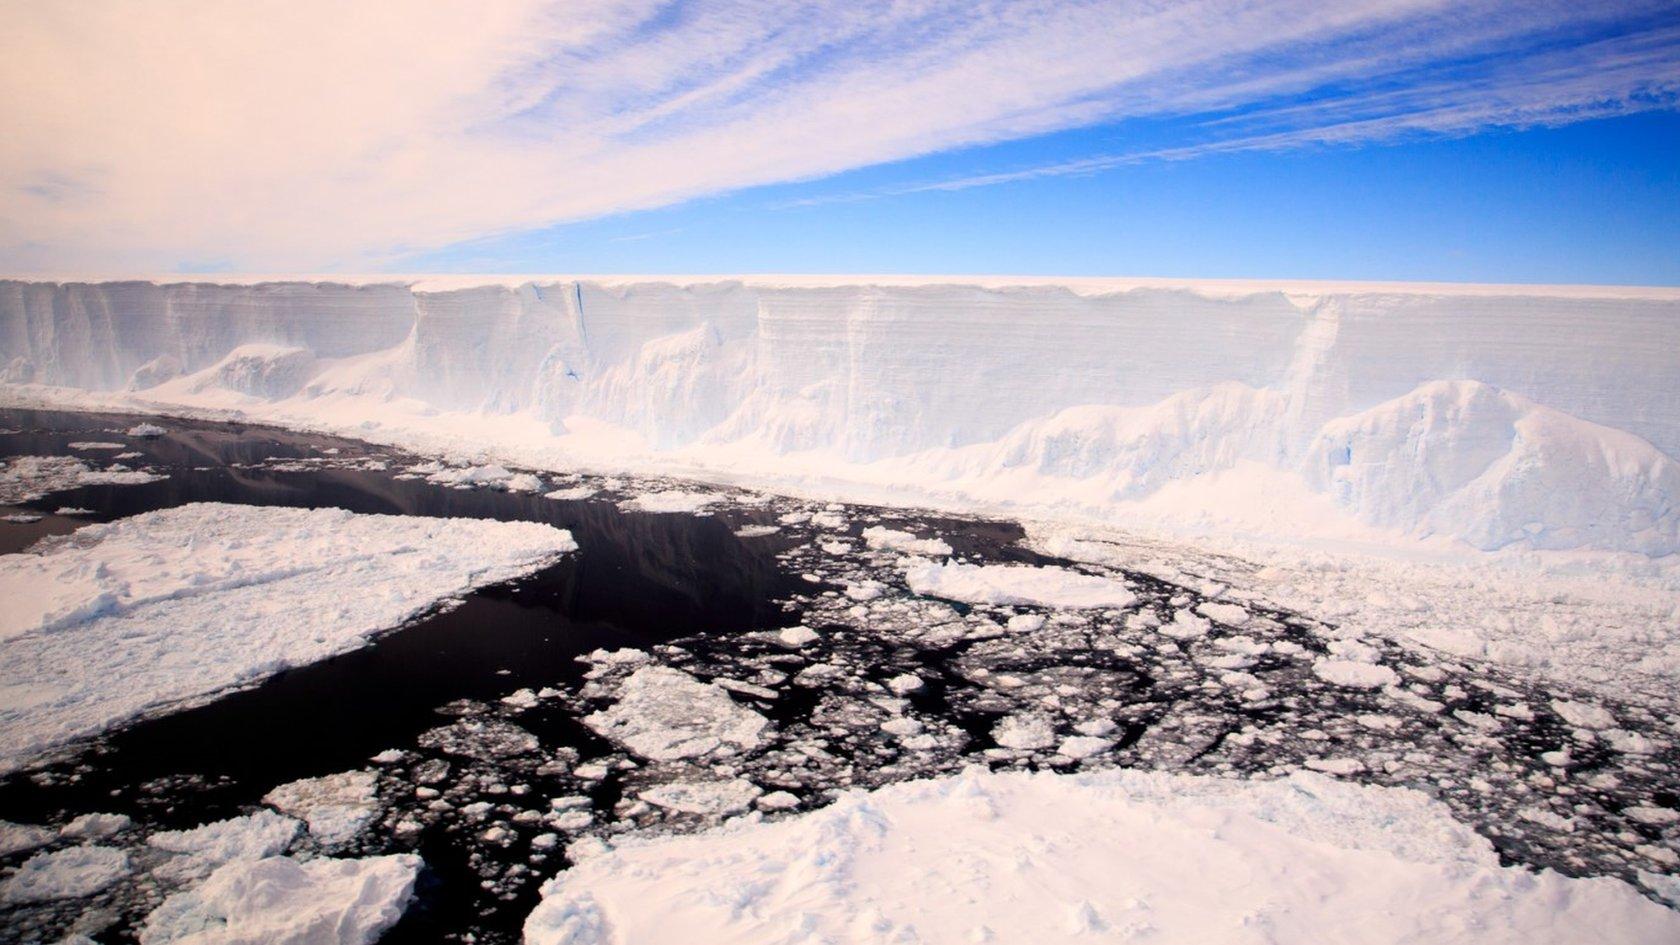 UK team set for giant Antarctic iceberg expedition